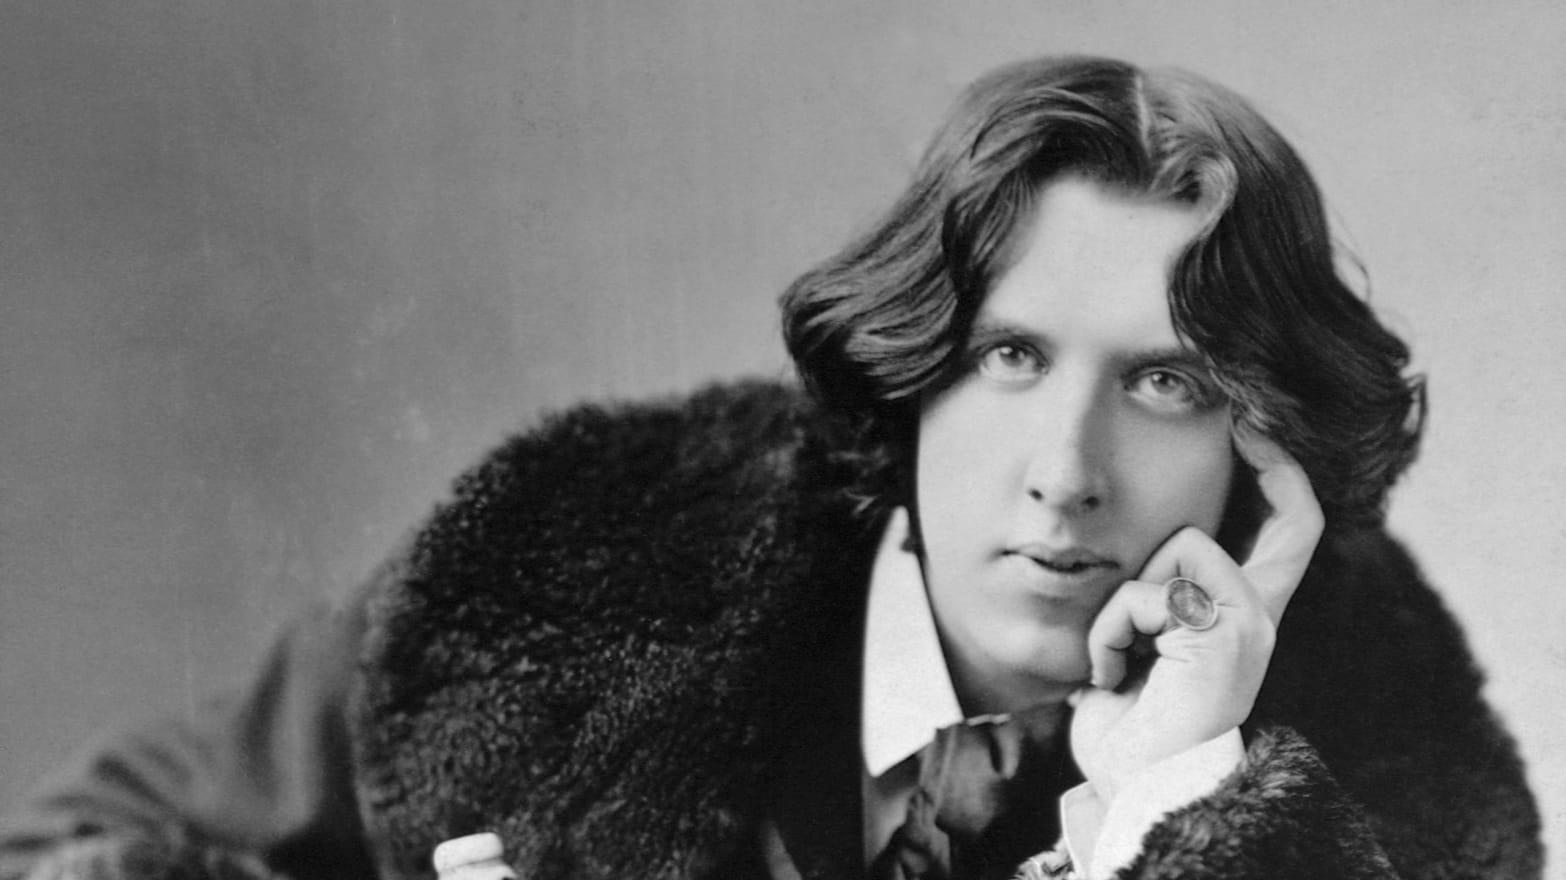 Oscar Wilde in America: The Interviews